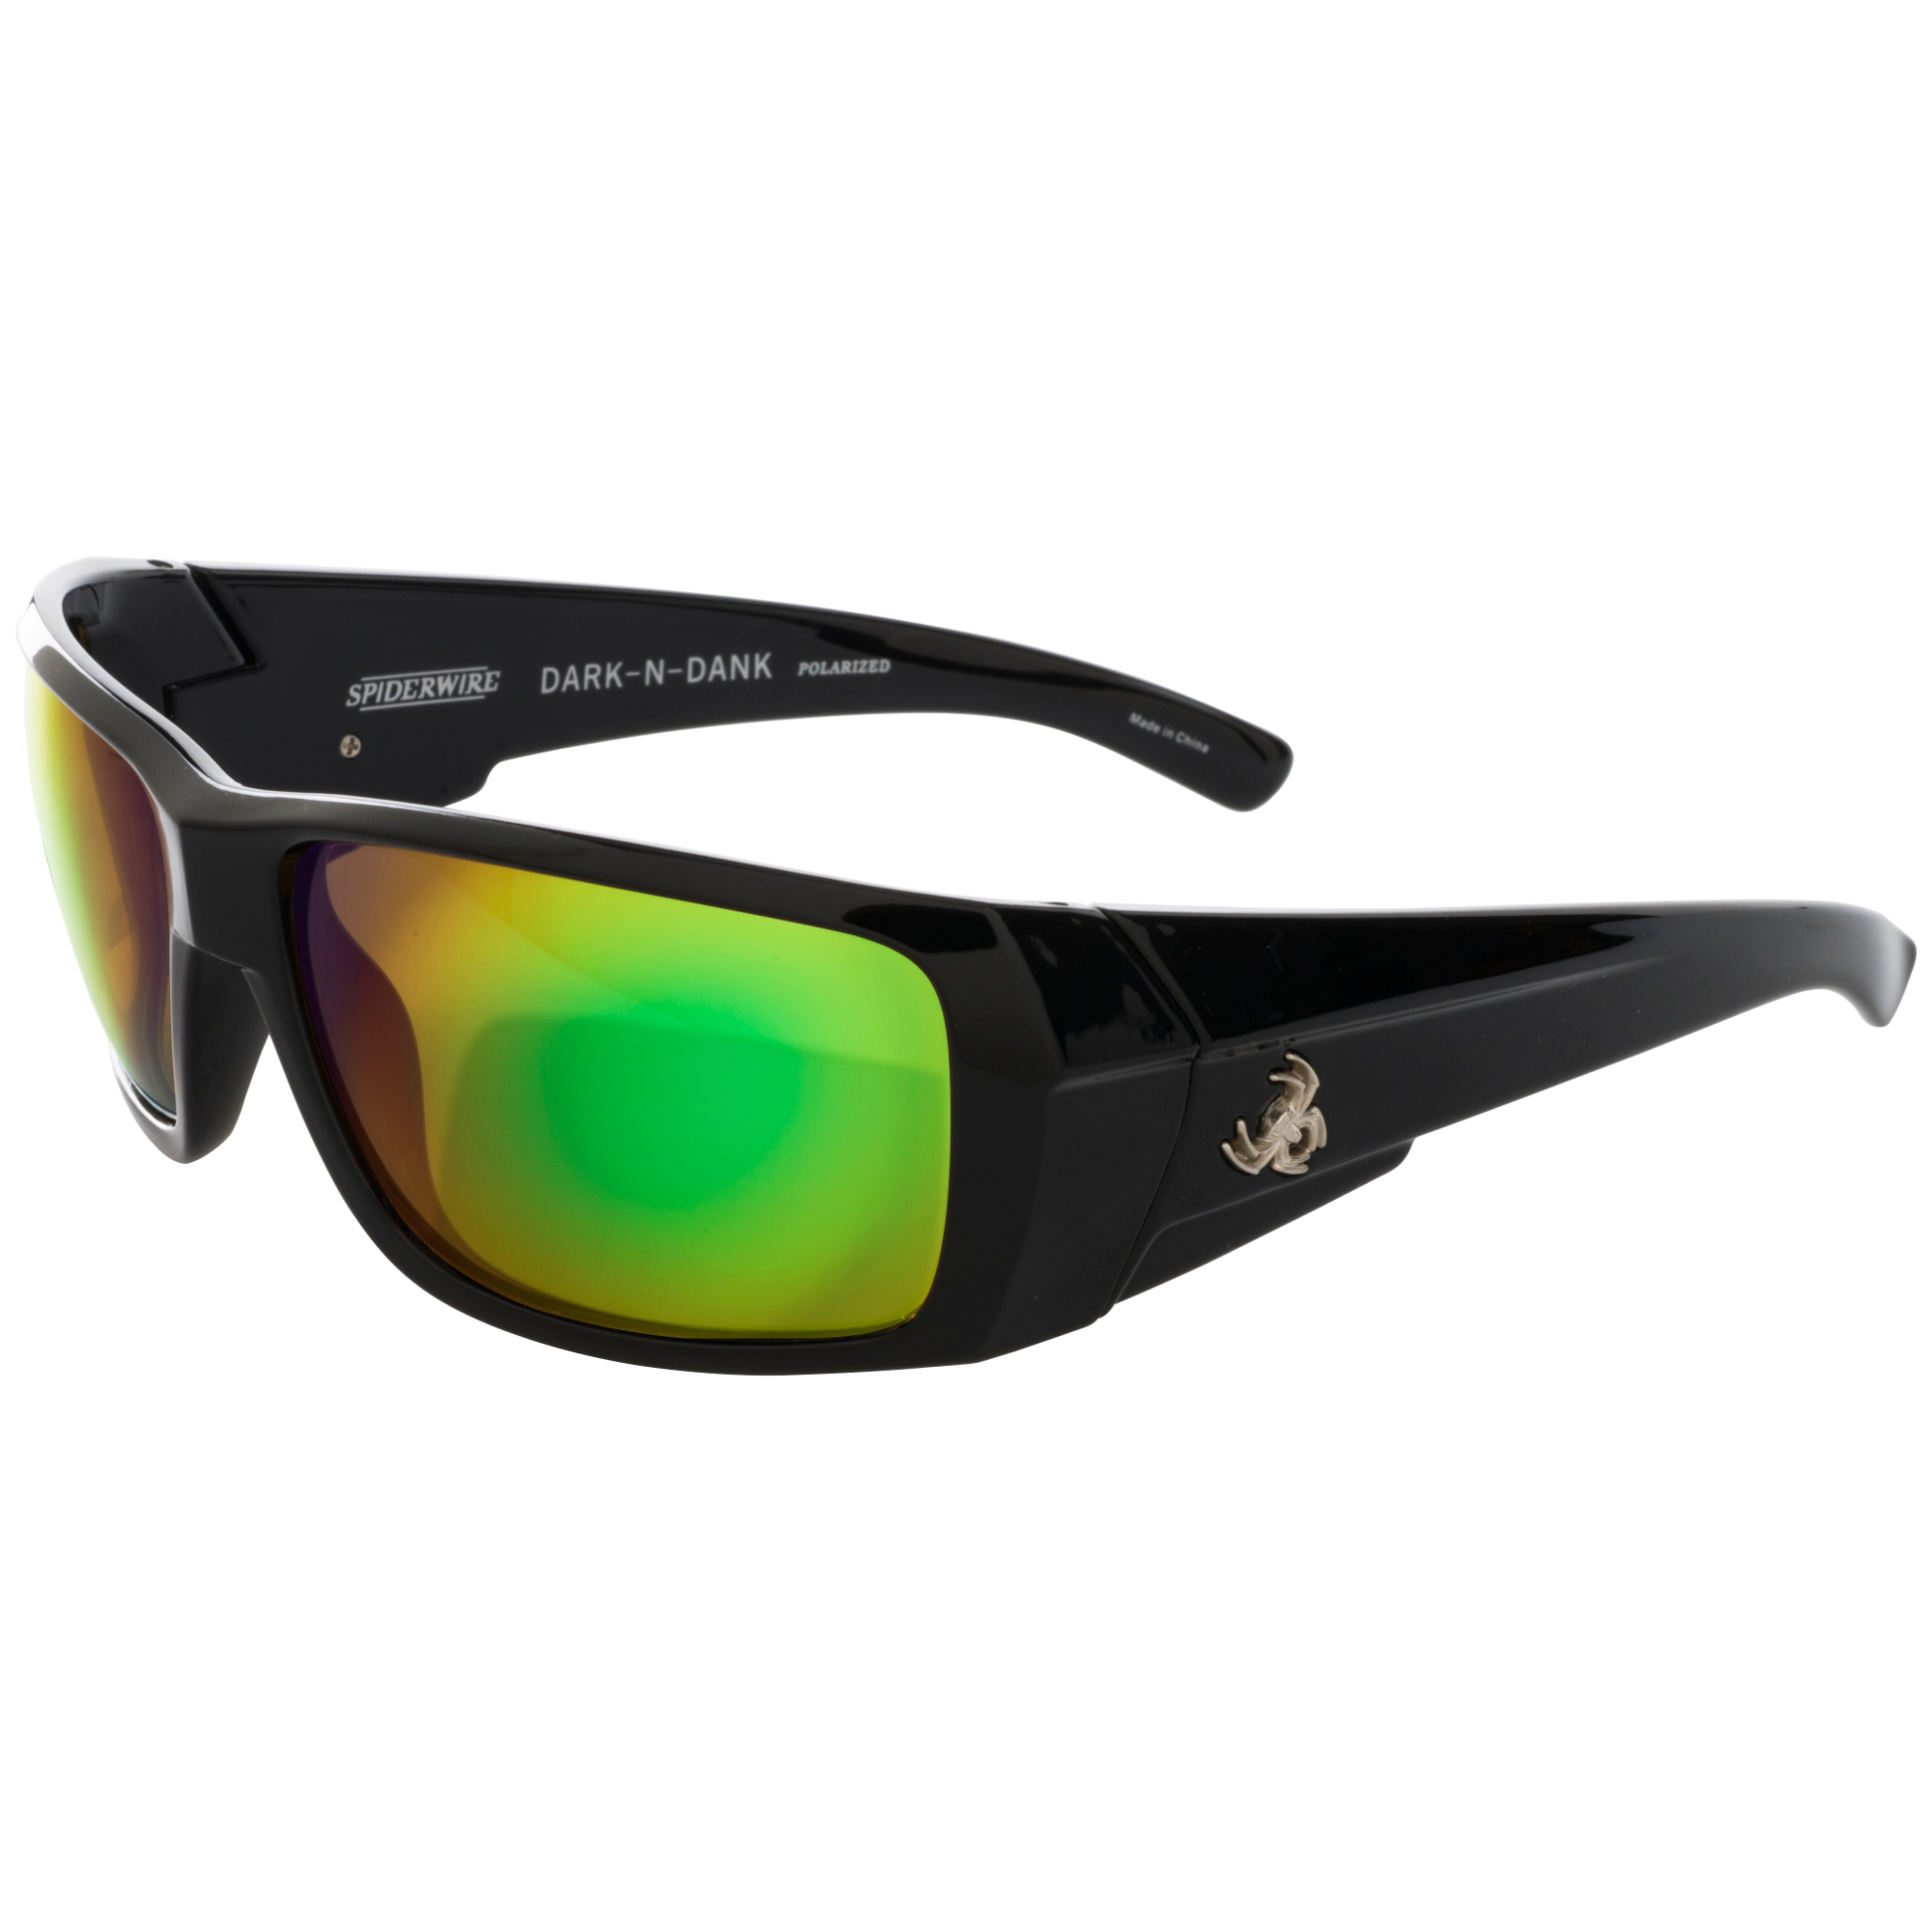 f2ea3249ef Spyder Polarized Sunglasses. Spider Polarized Sunglasses